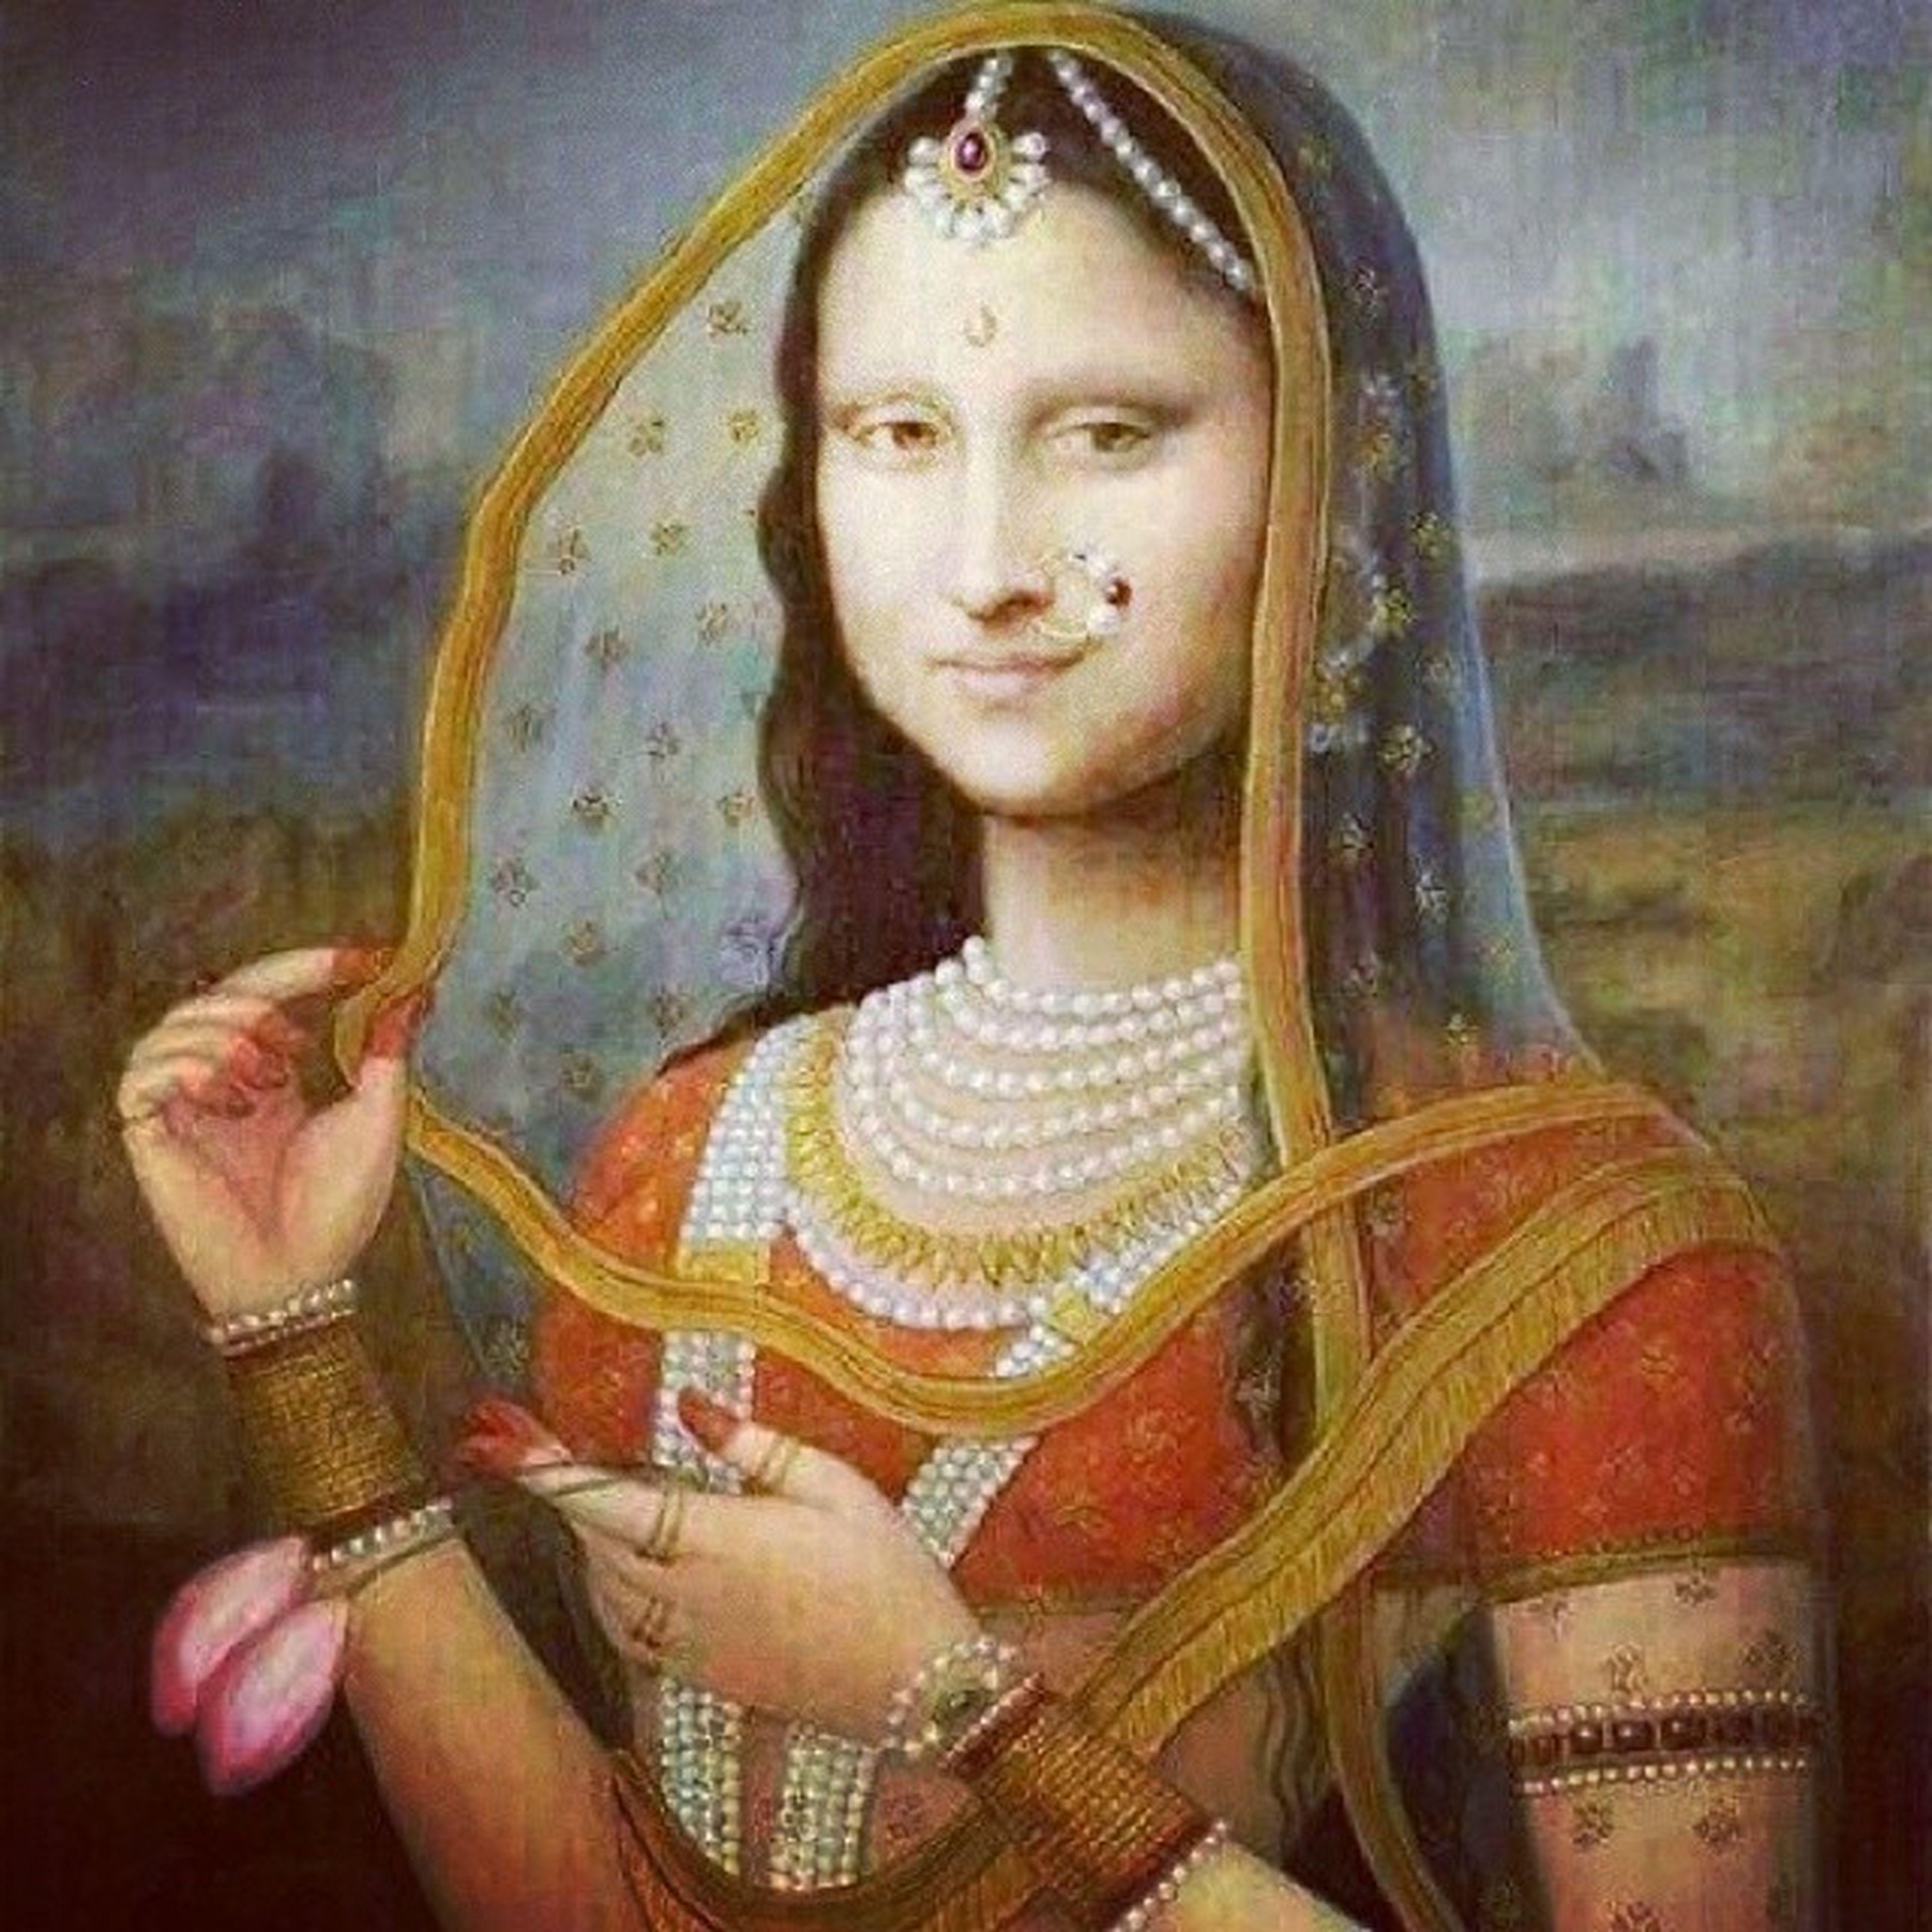 Rajkumari Rajkumari_monalisa Monalisa Rajwada Indian Dulhan